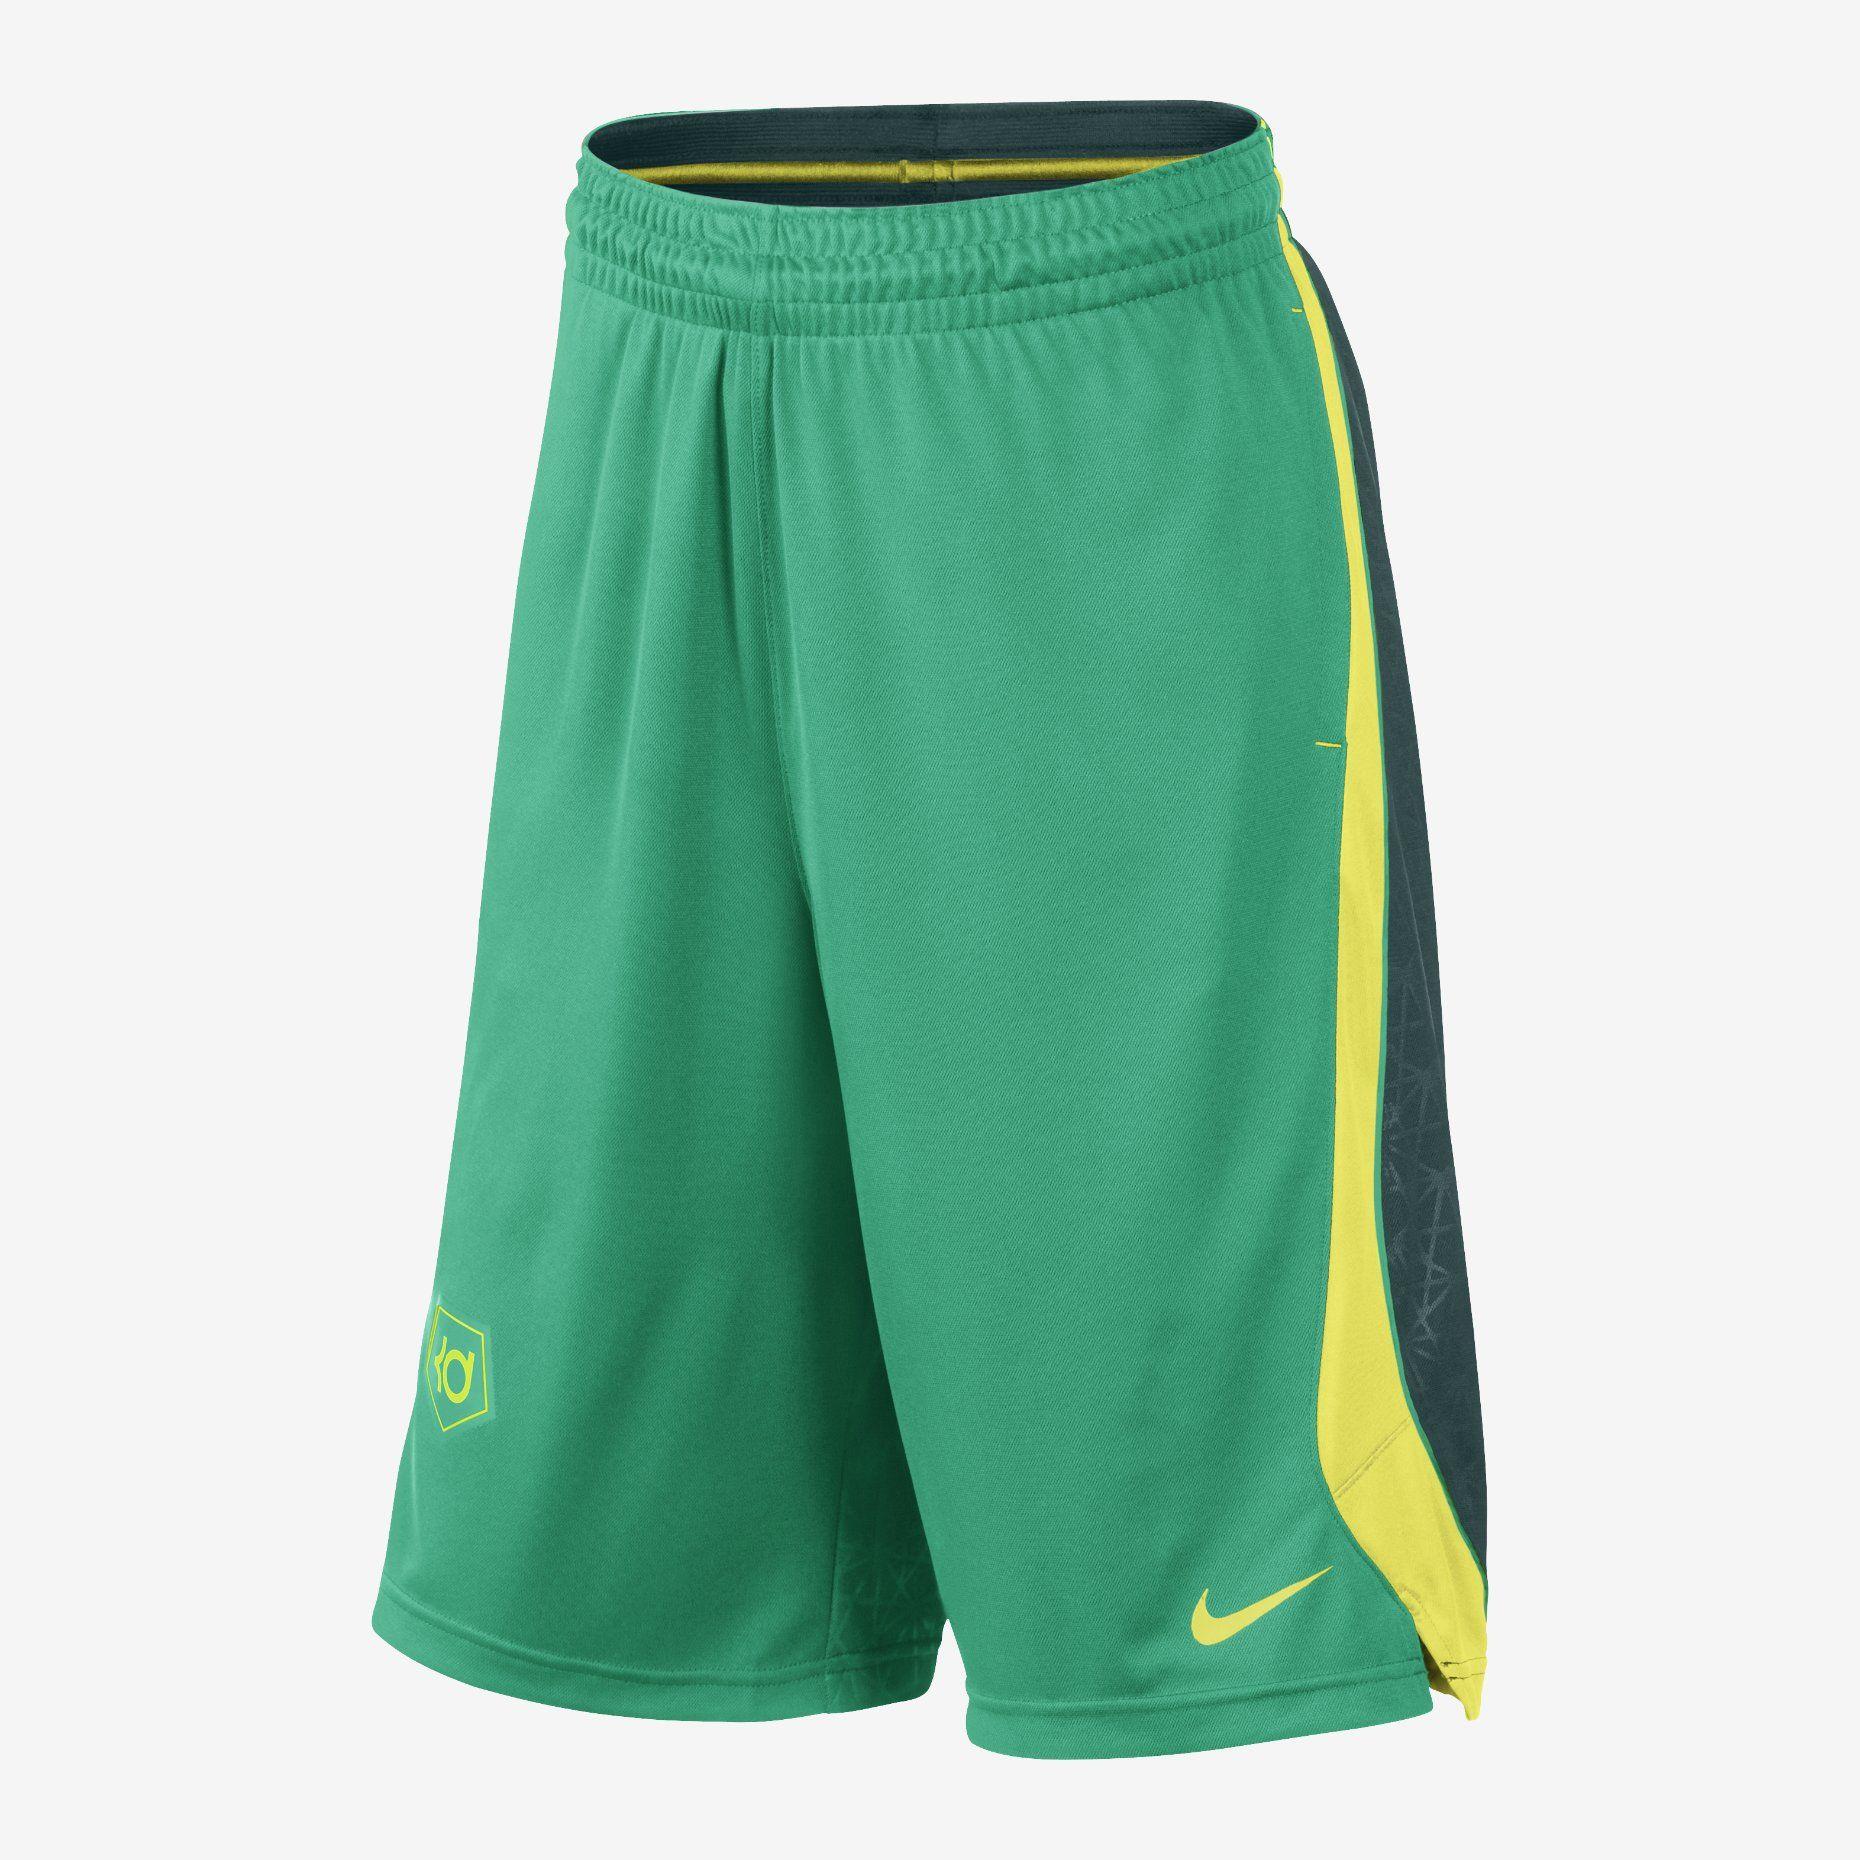 1ad4ea6a27 Nike Store. Nike KD 5 Men's Basketball Shorts | Clothing and ...